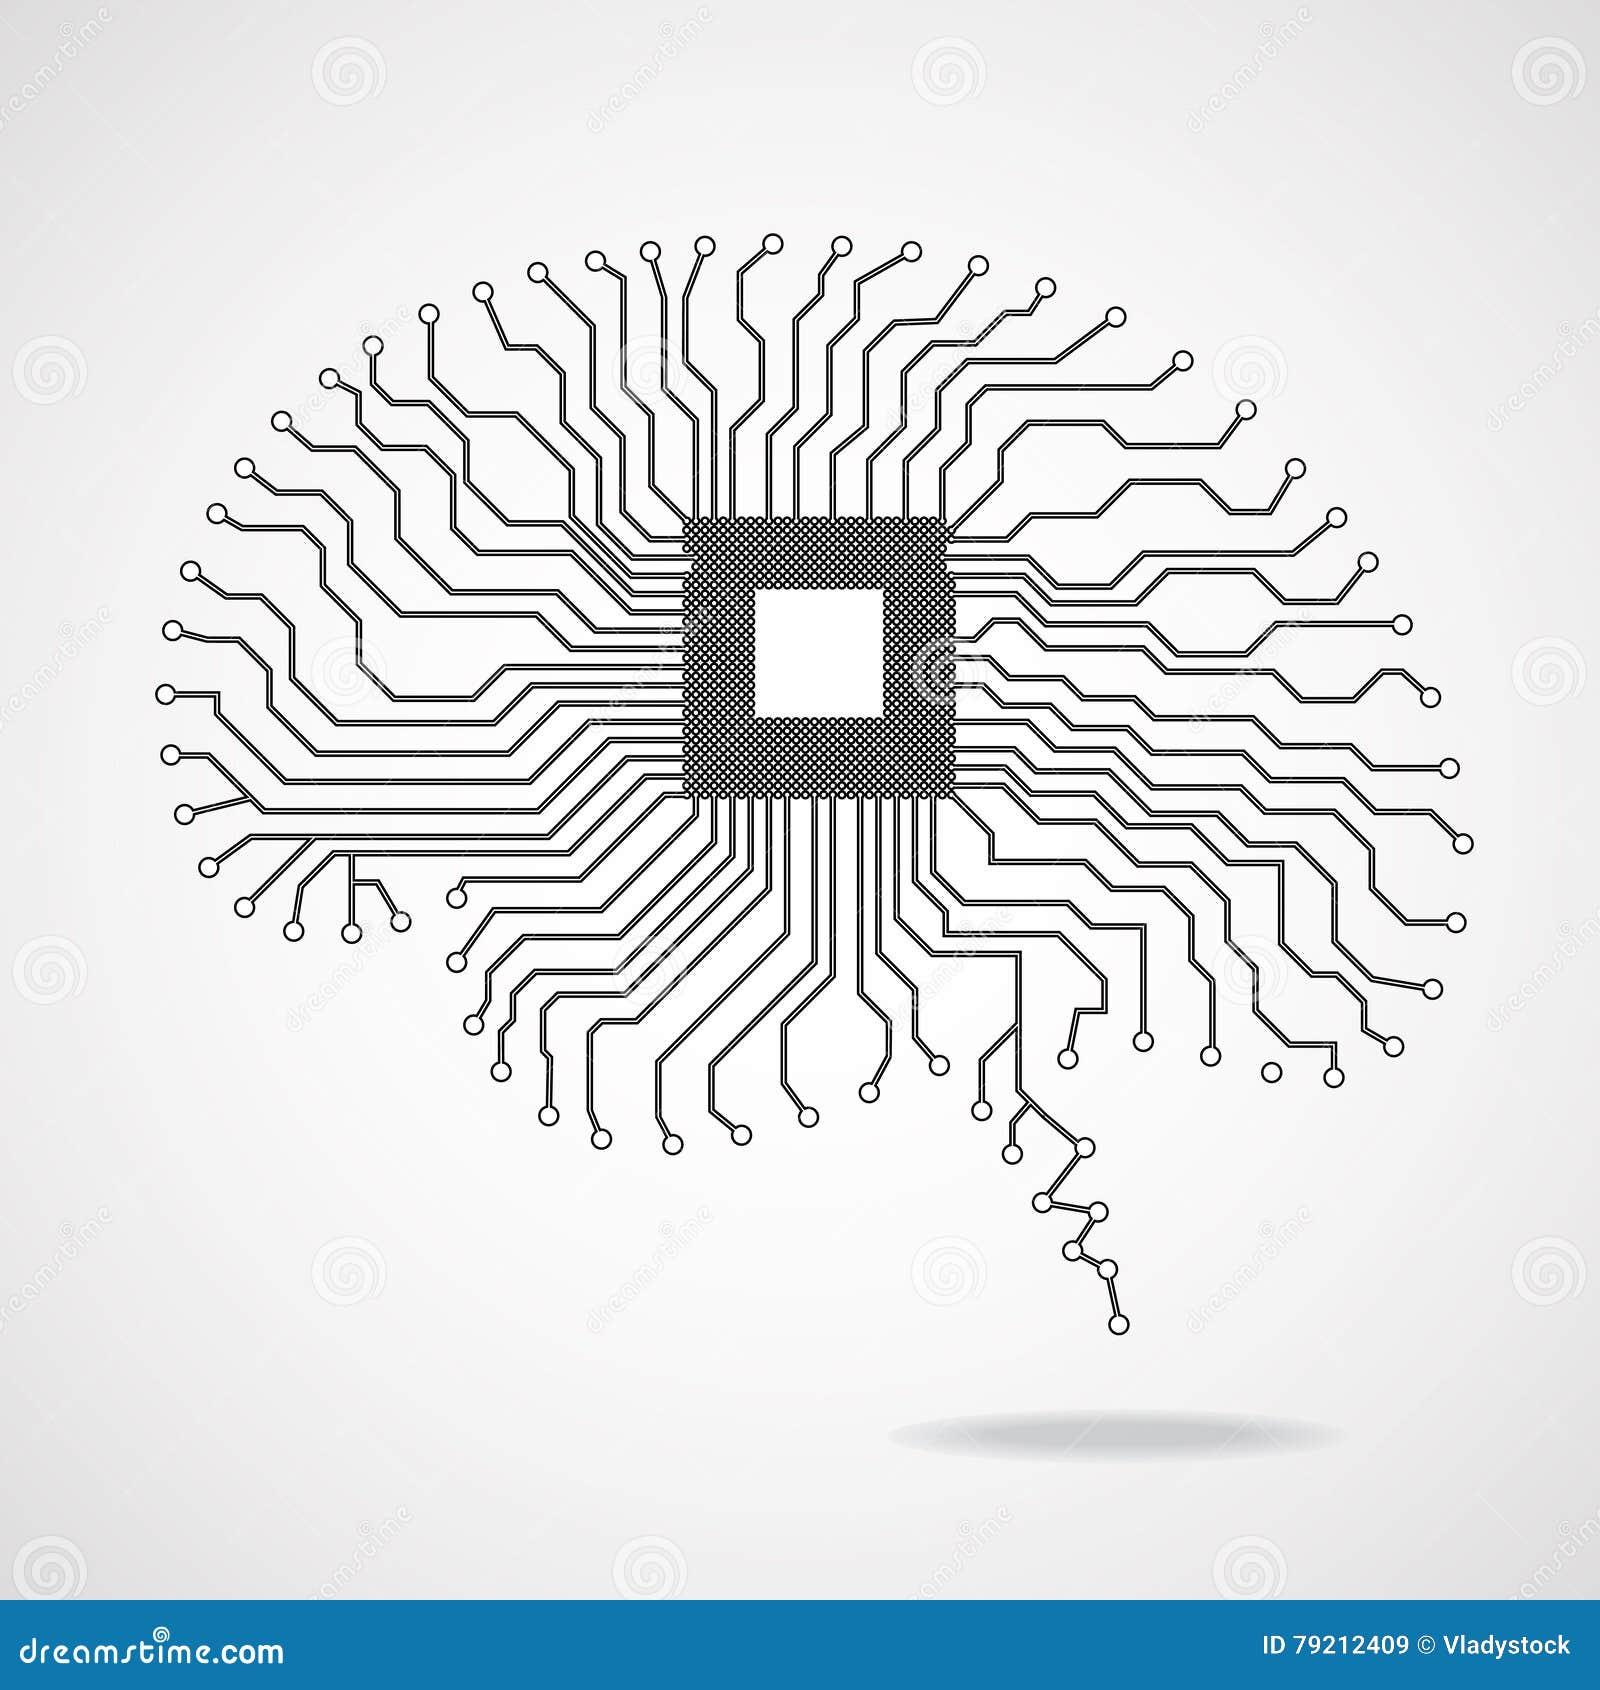 Circuito Vascular : Brain. cpu. circuit board stock vector. illustration of design